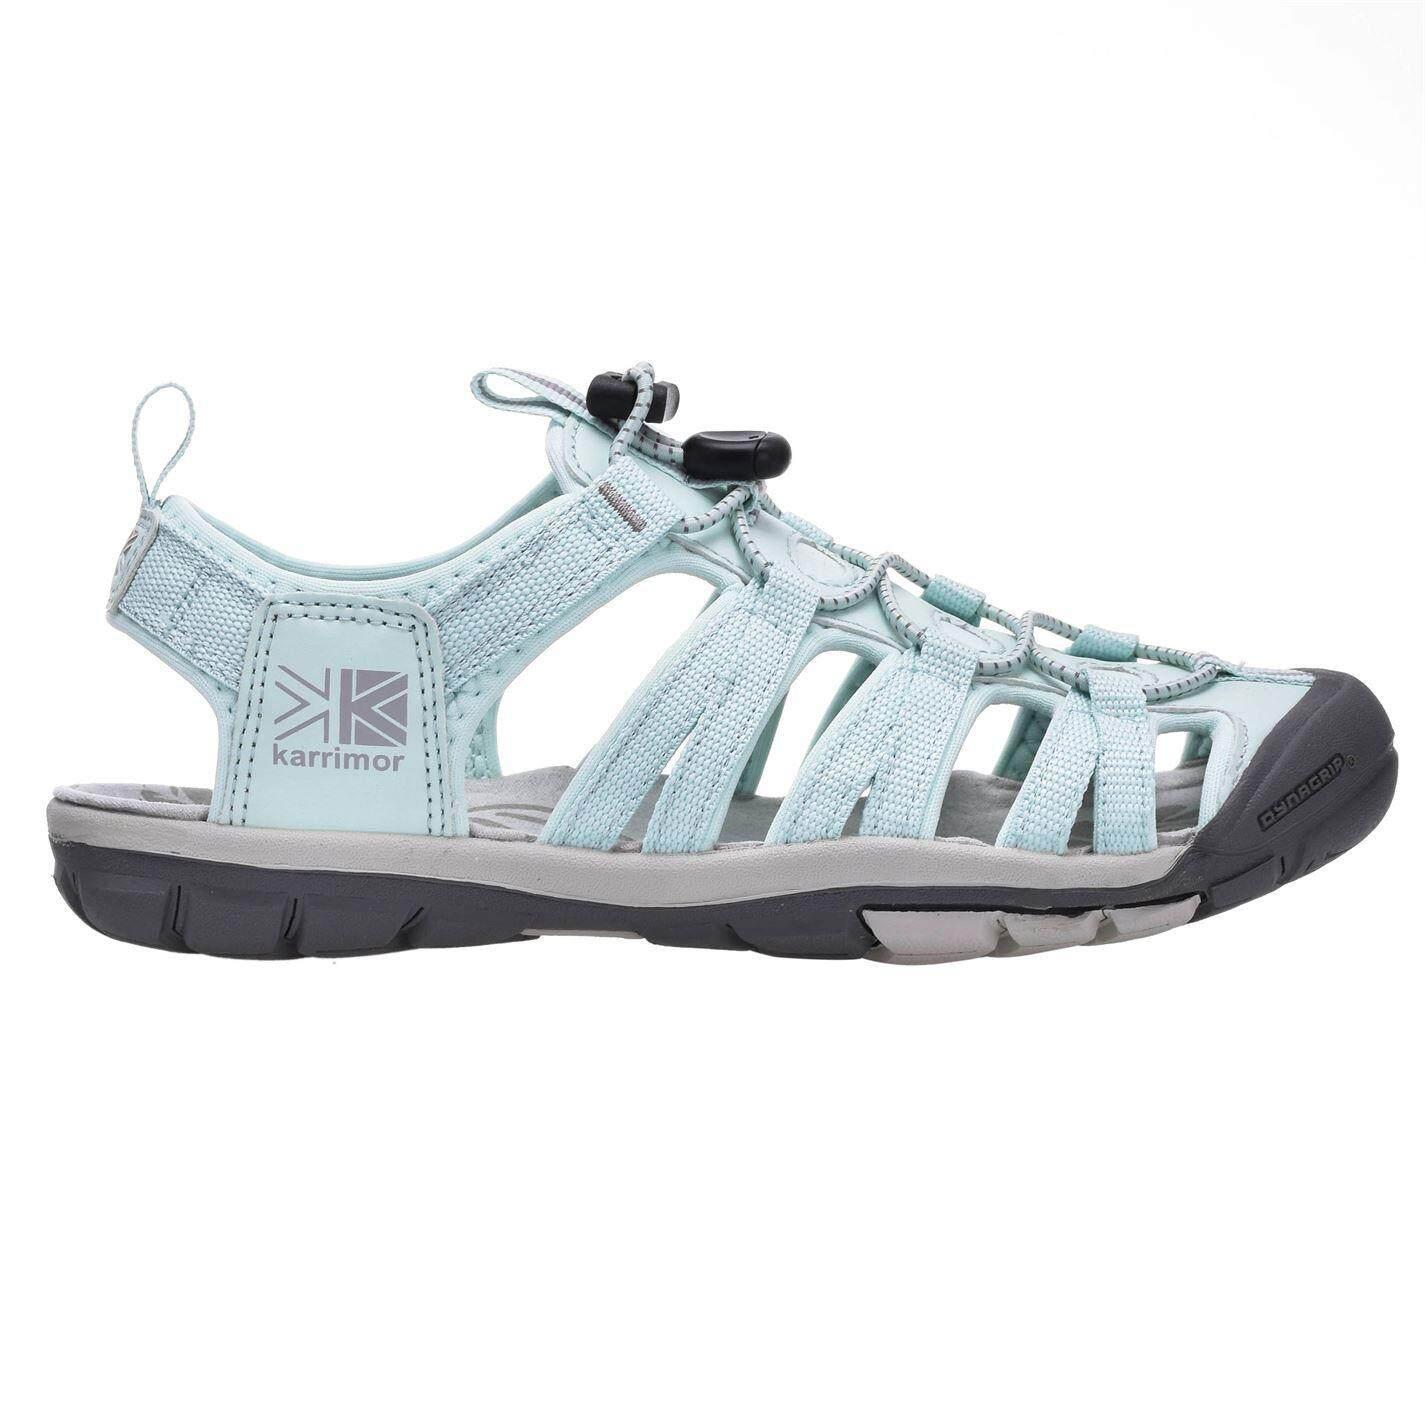 Karrimor Mens Ithaca Walking Sandals Lace Up Summer